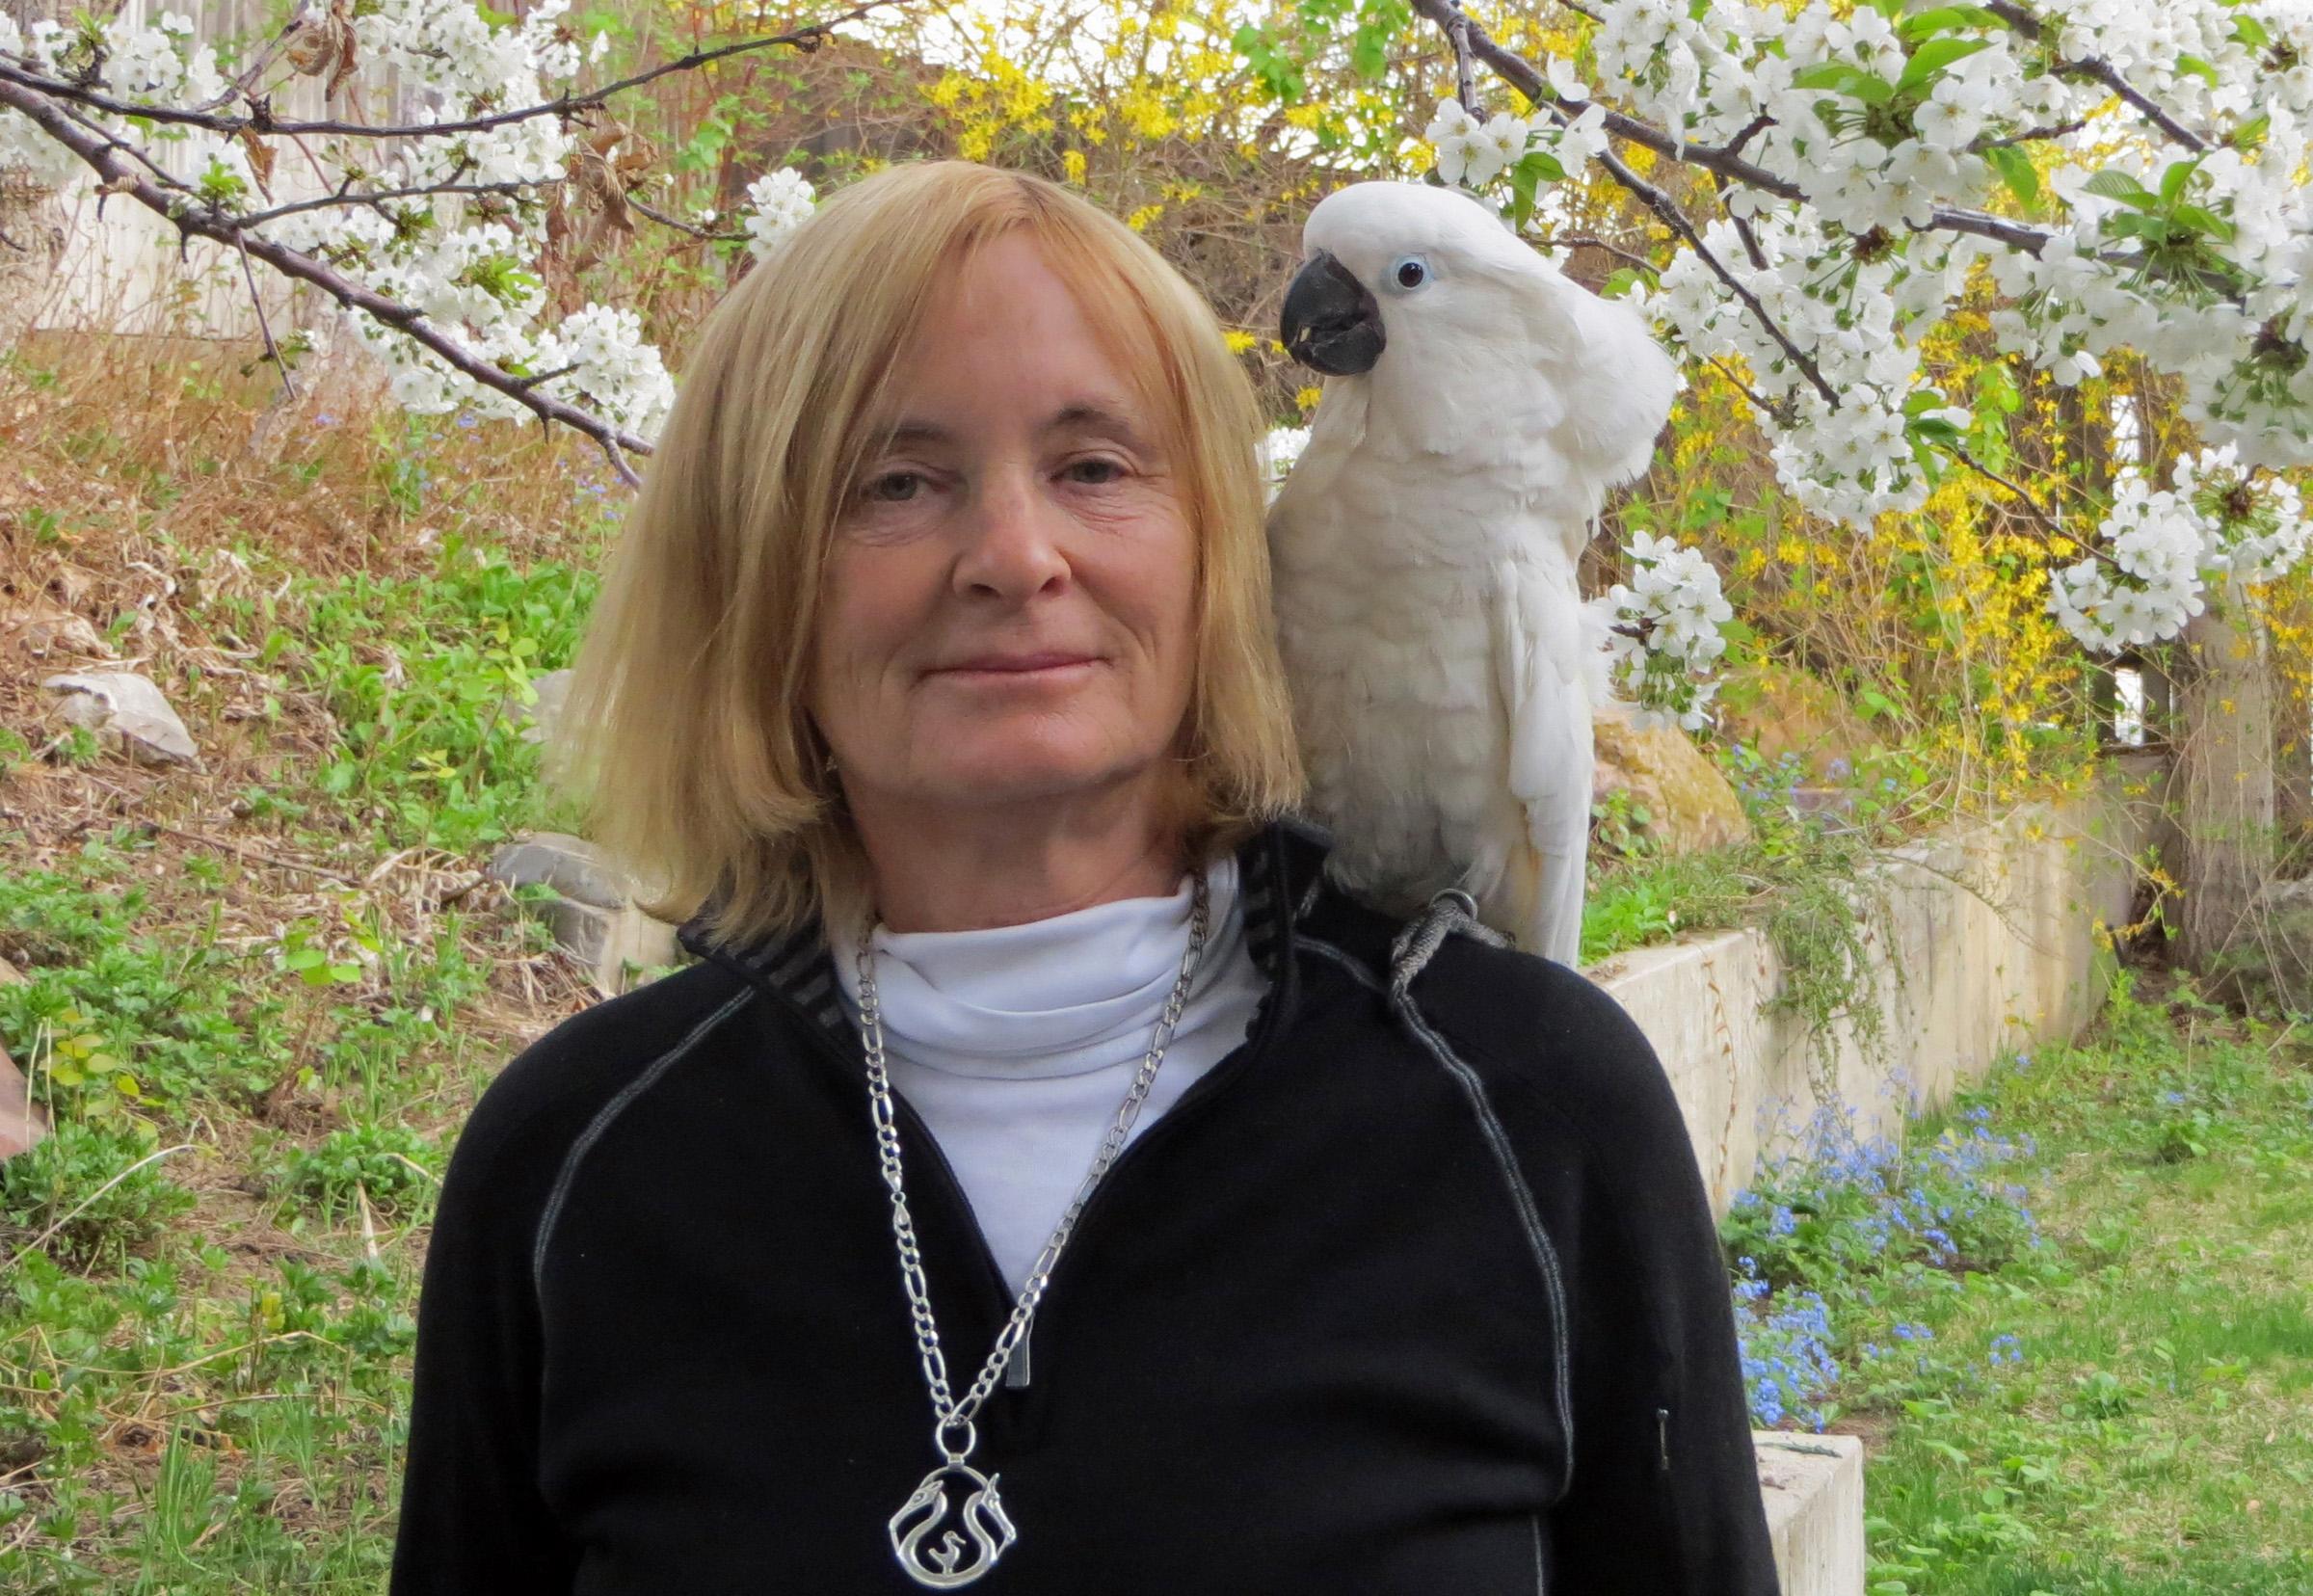 University of Utah anthropology professor Polly Wiessner with Bird, her pet cockatoo.